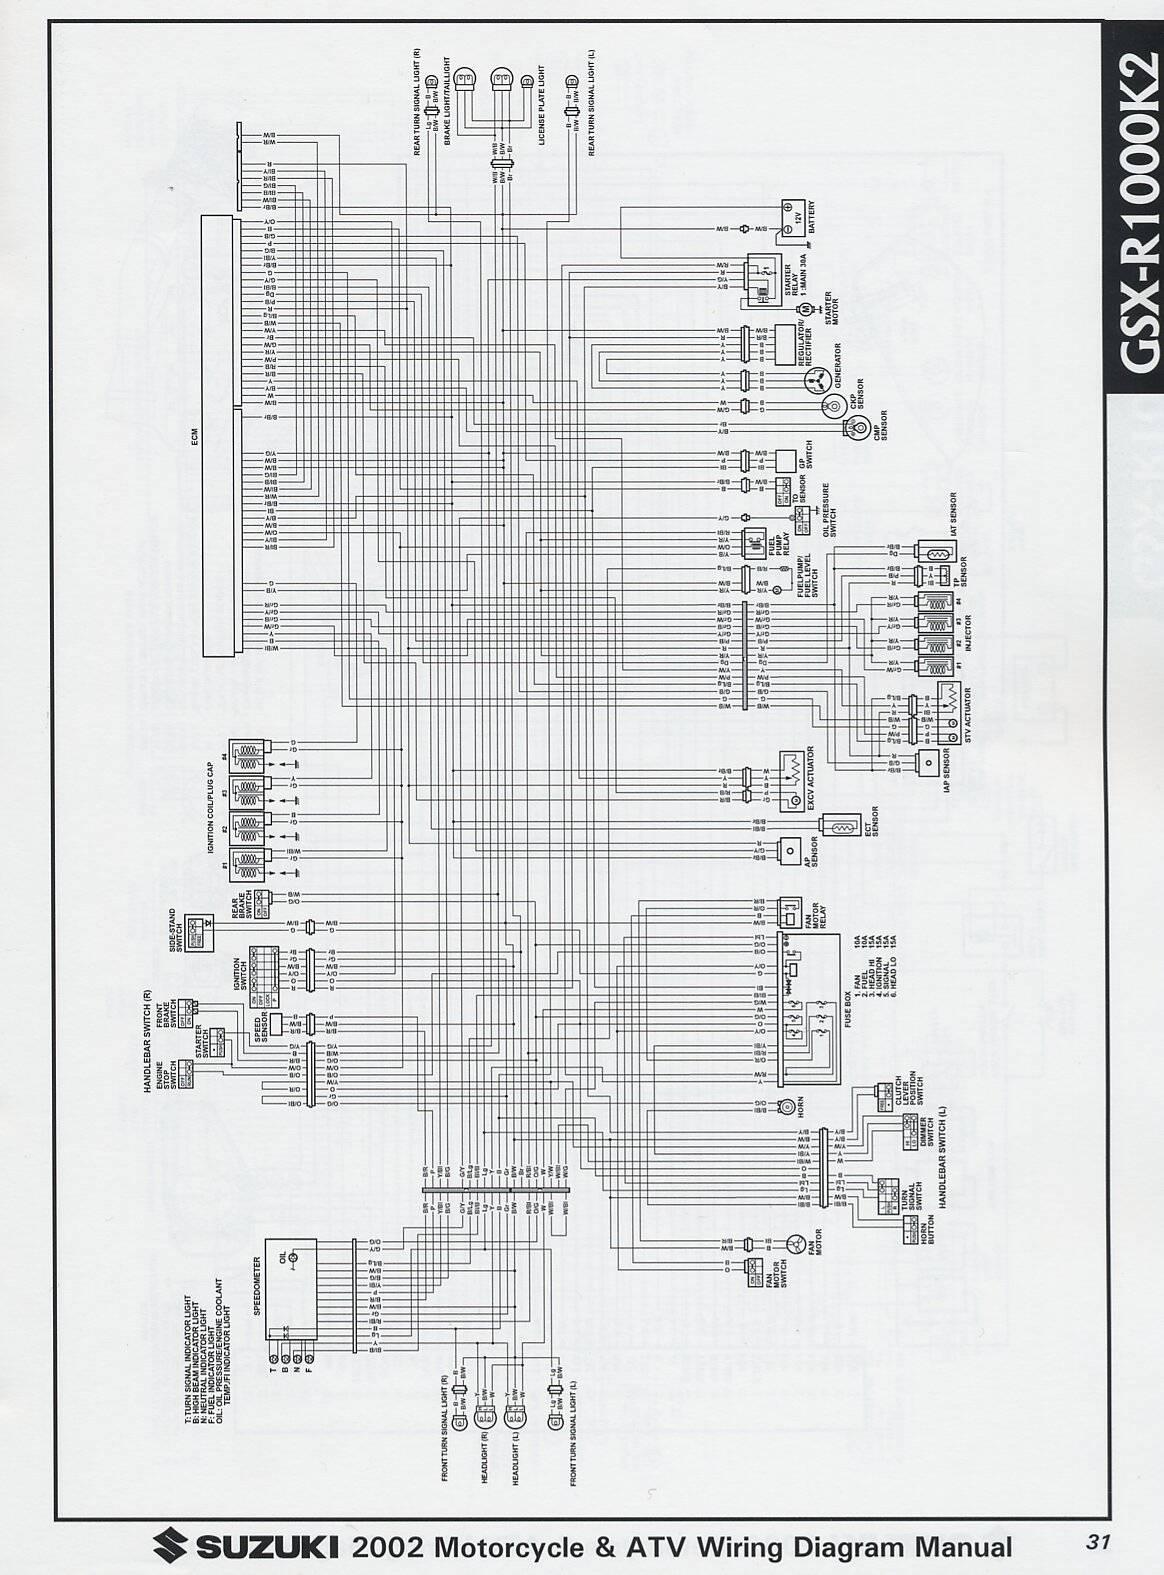 hight resolution of  gsxr 1000 wiring diagram directory listing of www edubs net bikestuff gsxr1000gsxr 1000k2 wiring jpeg